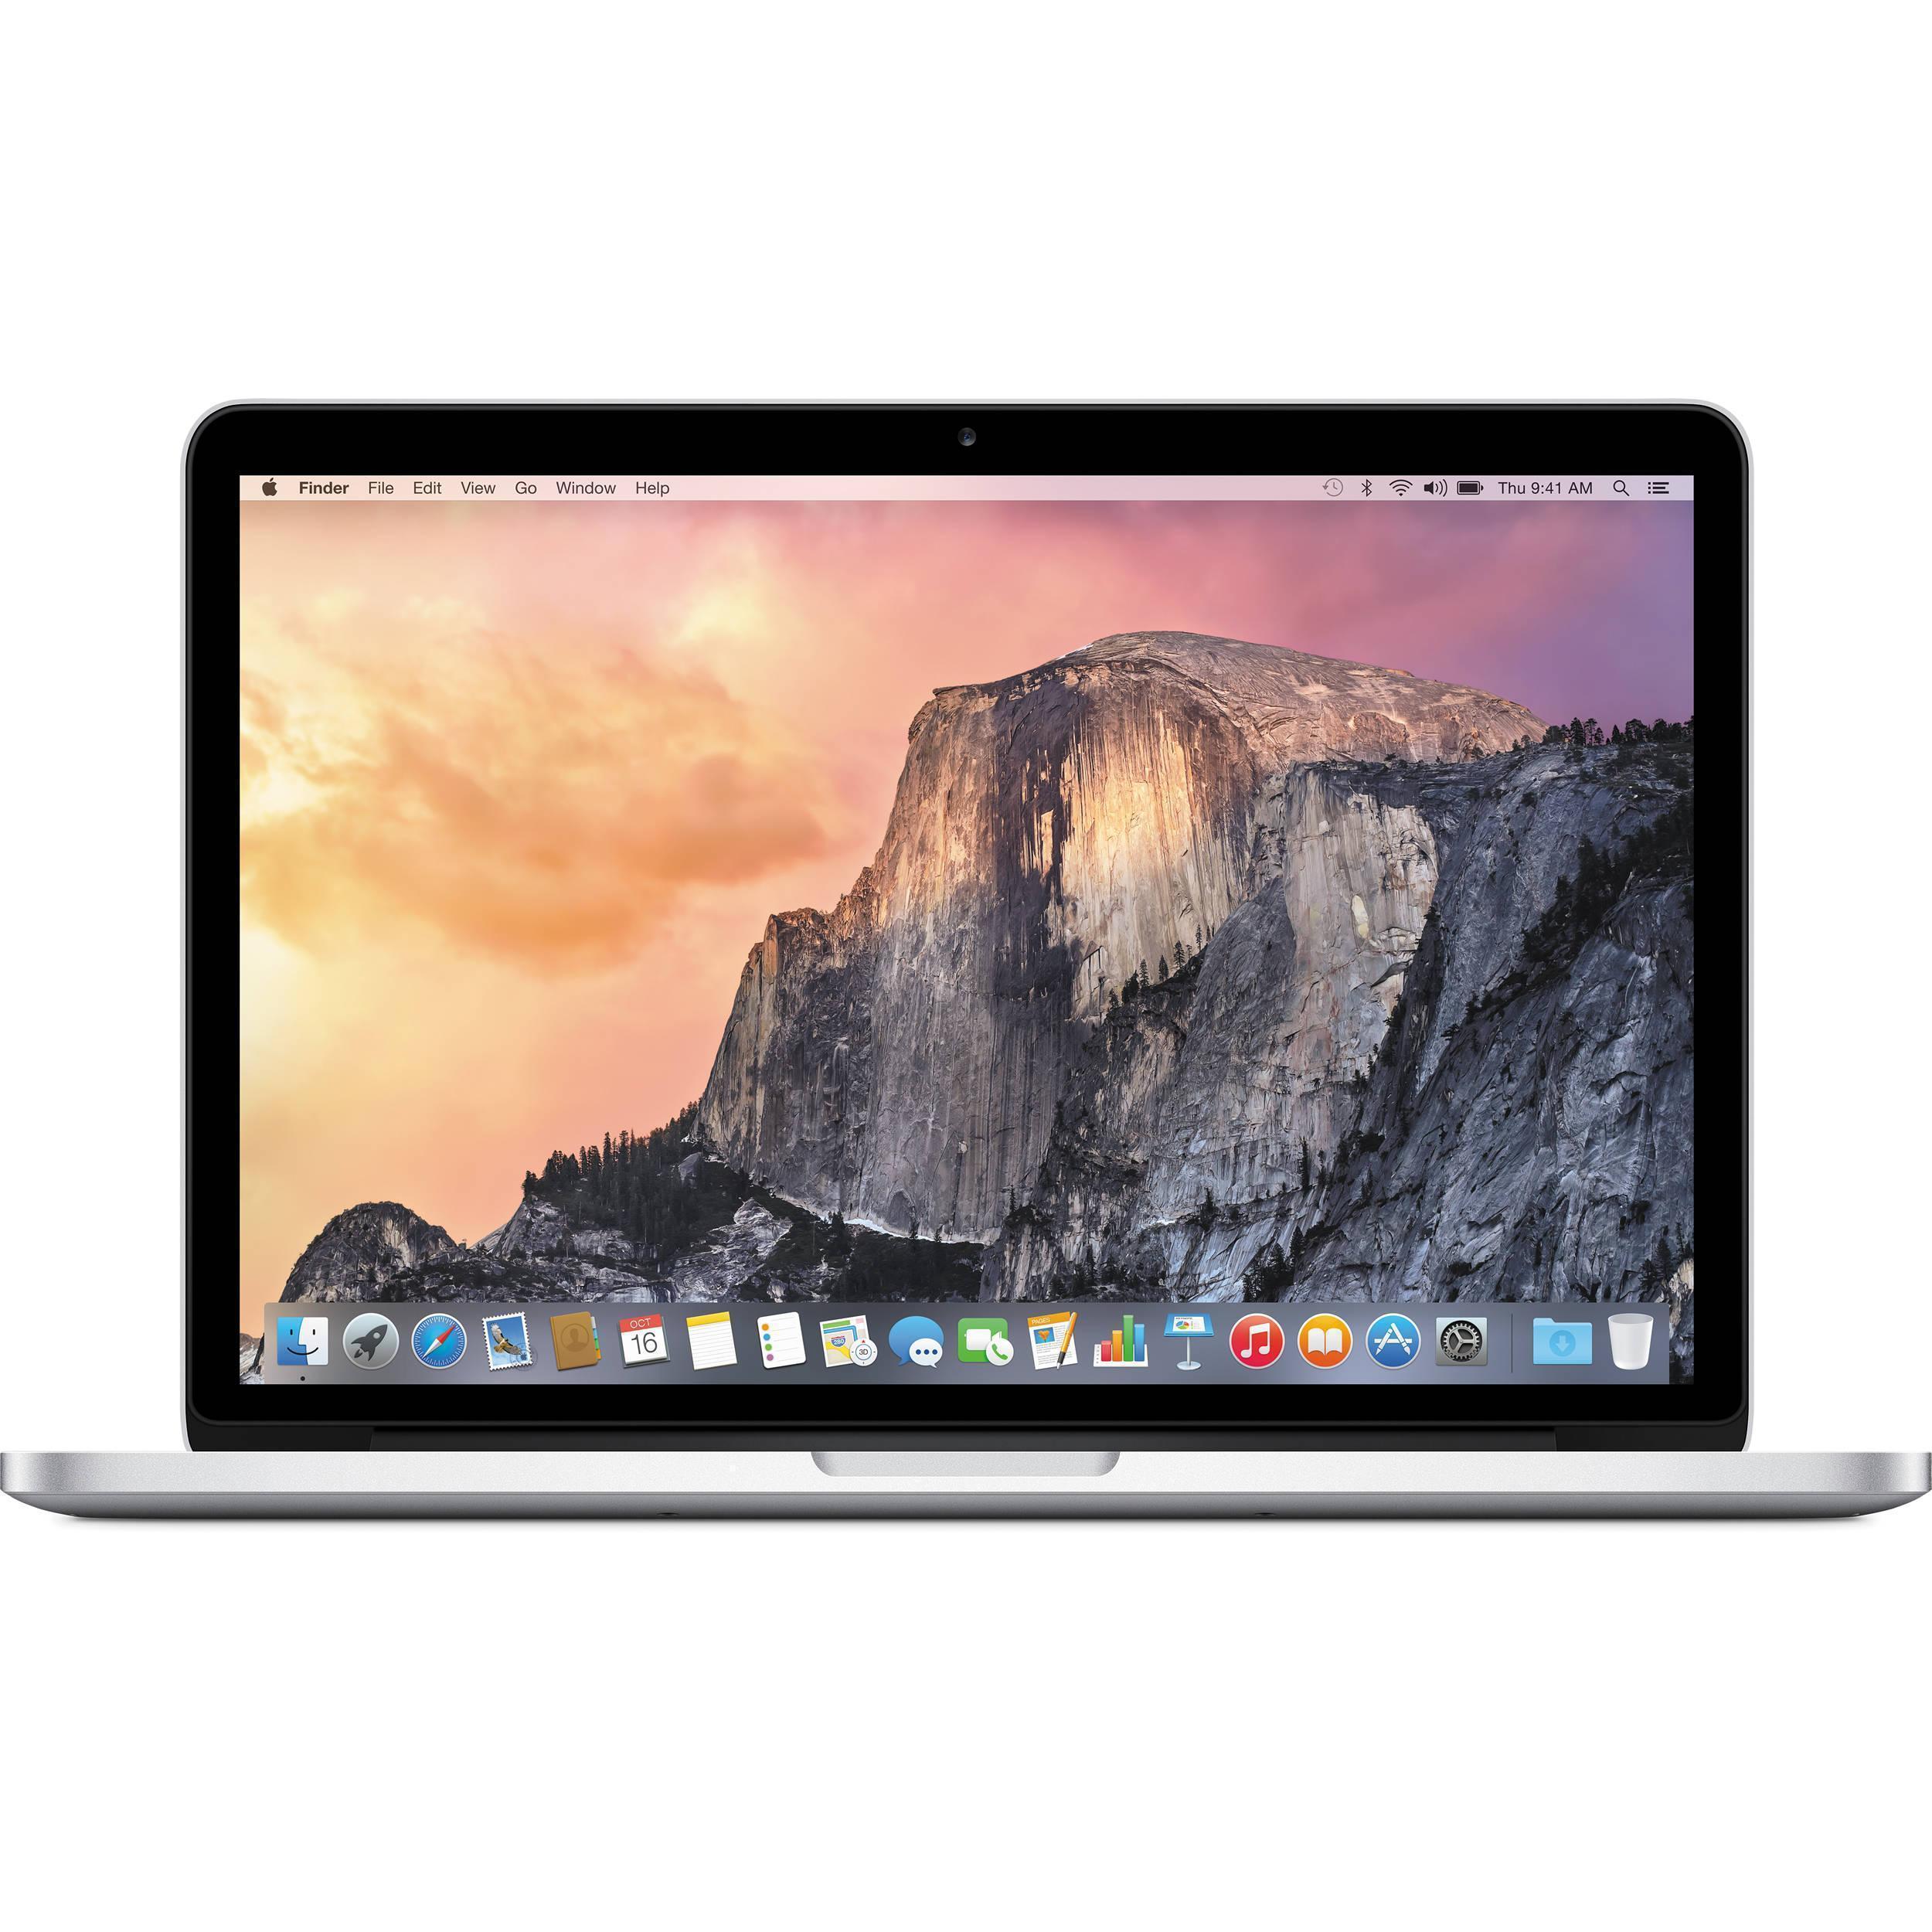 MacBook Pro Retina 13.3-inch (2013) - Core i5 - 8GB - SSD 256 GB QWERTY